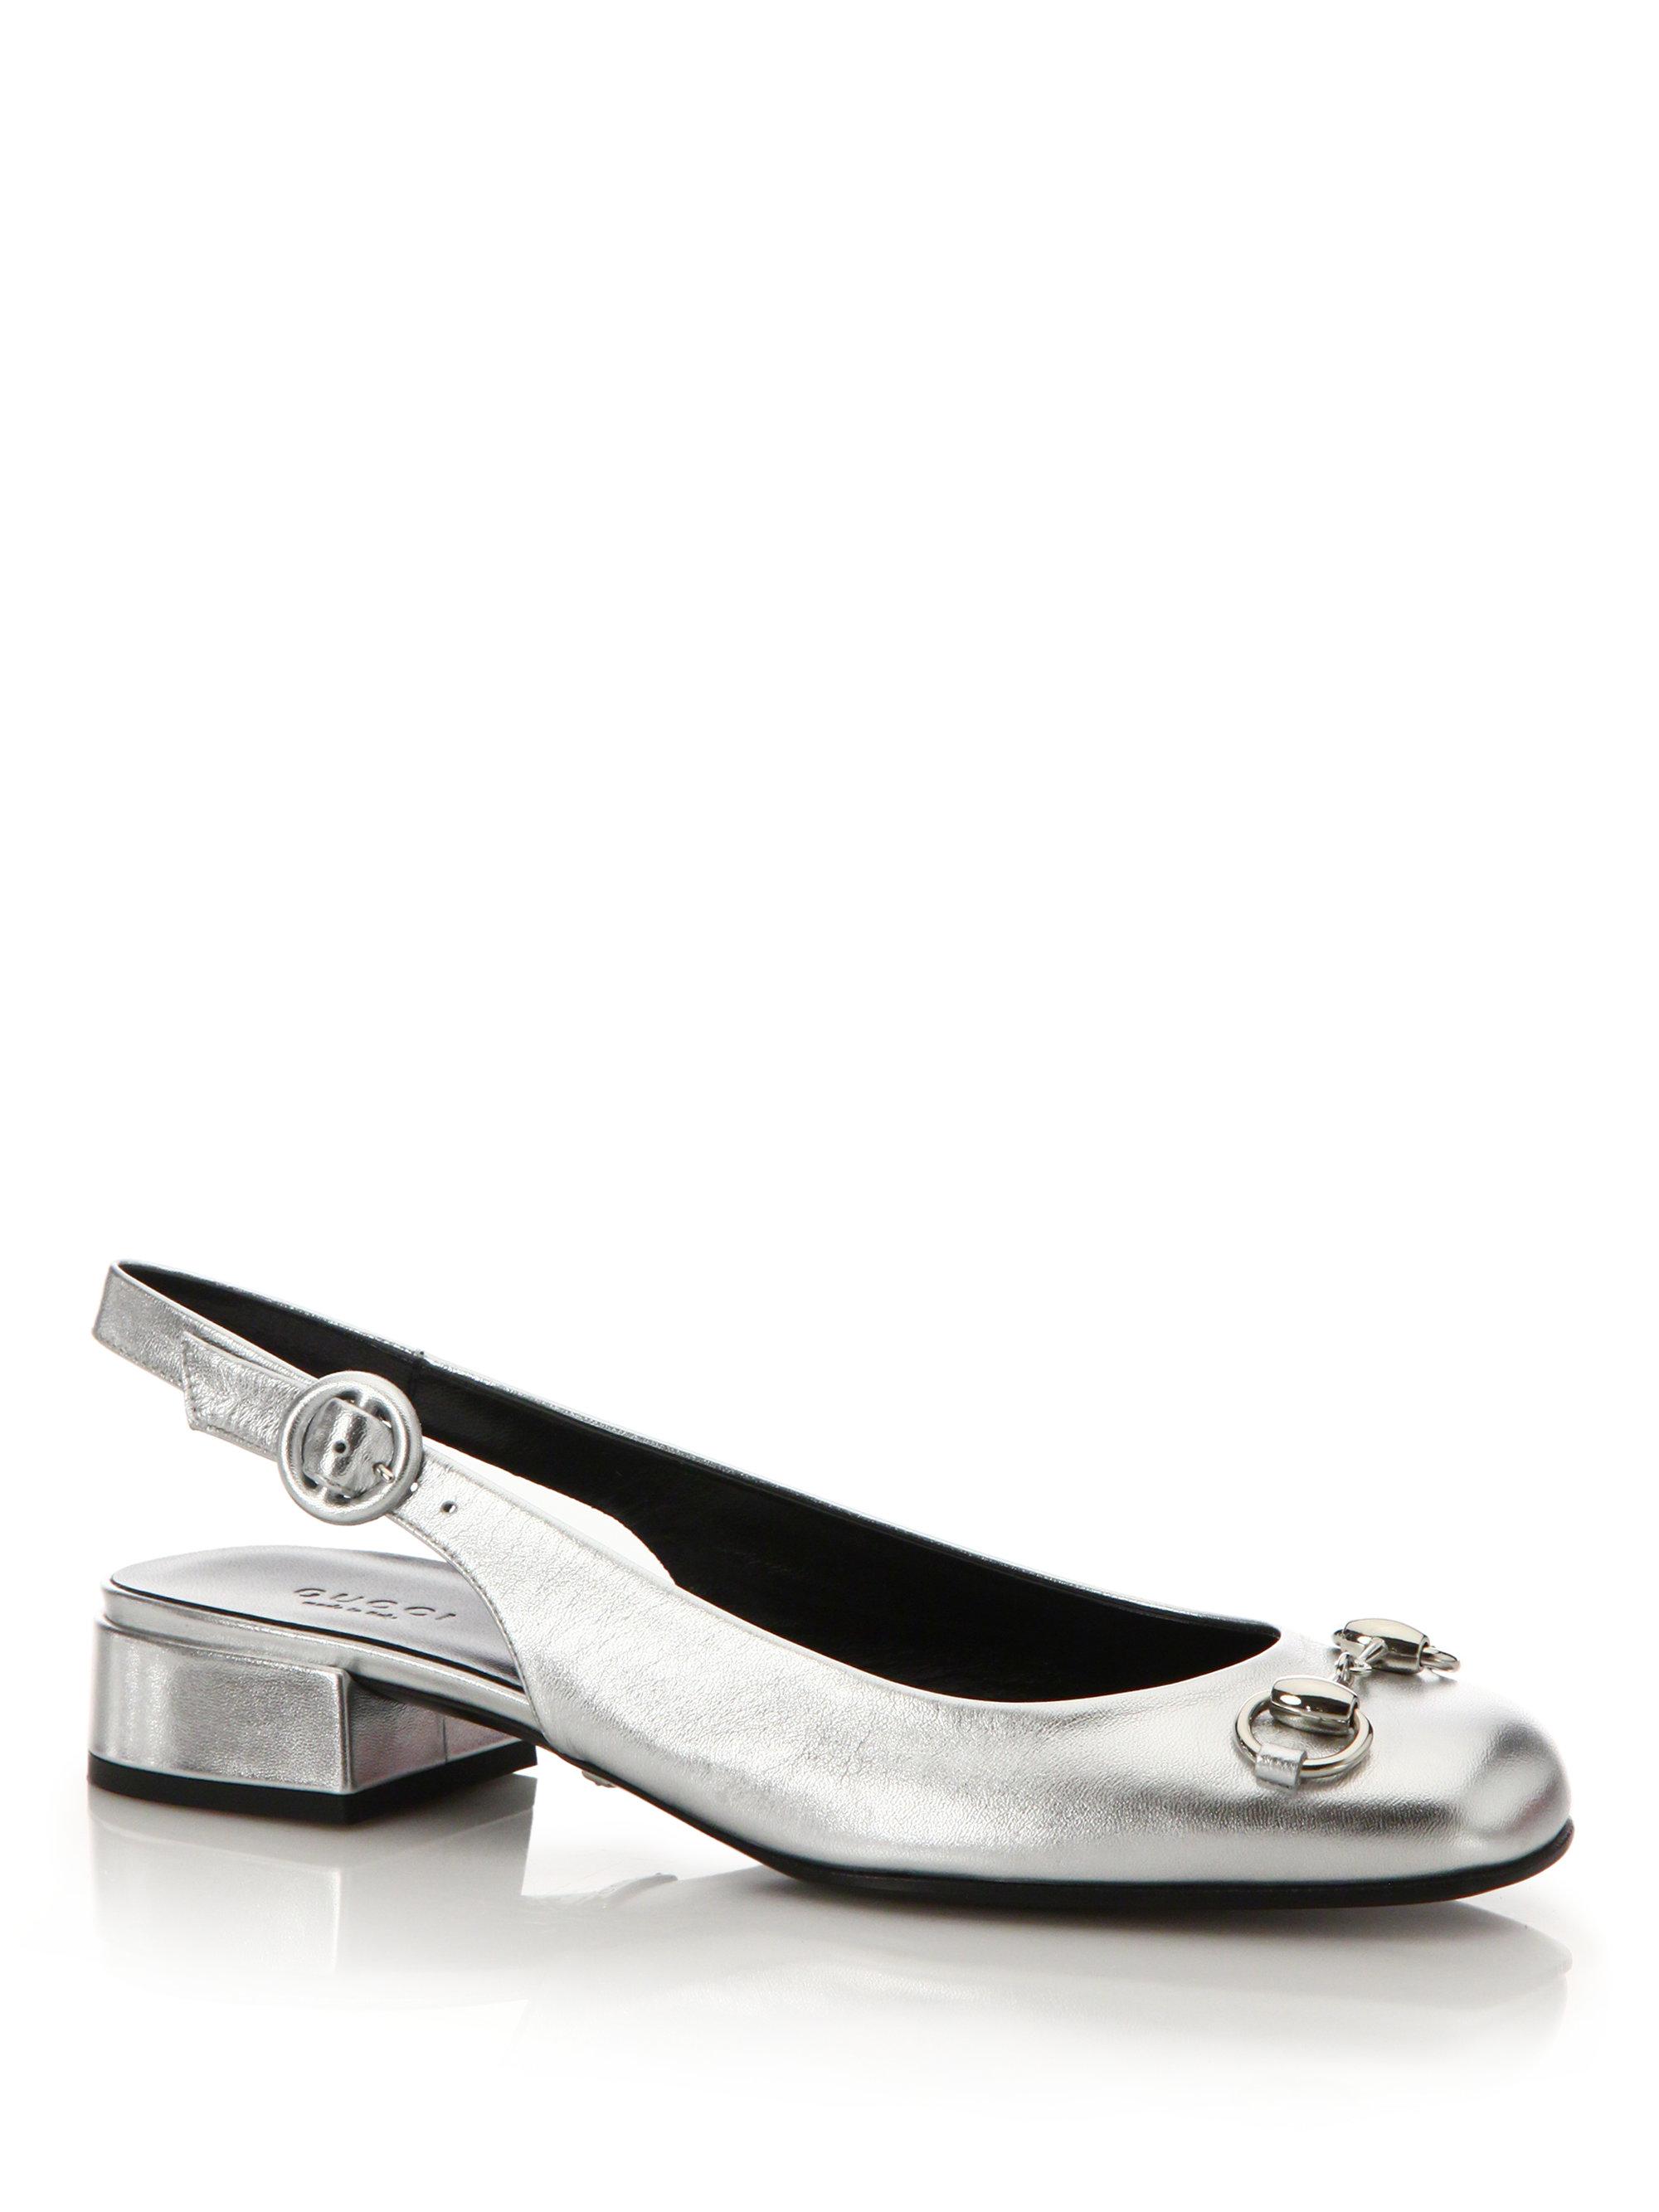 Lyst - Gucci Lillian Metallic Leather Slingback Flats in Metallic